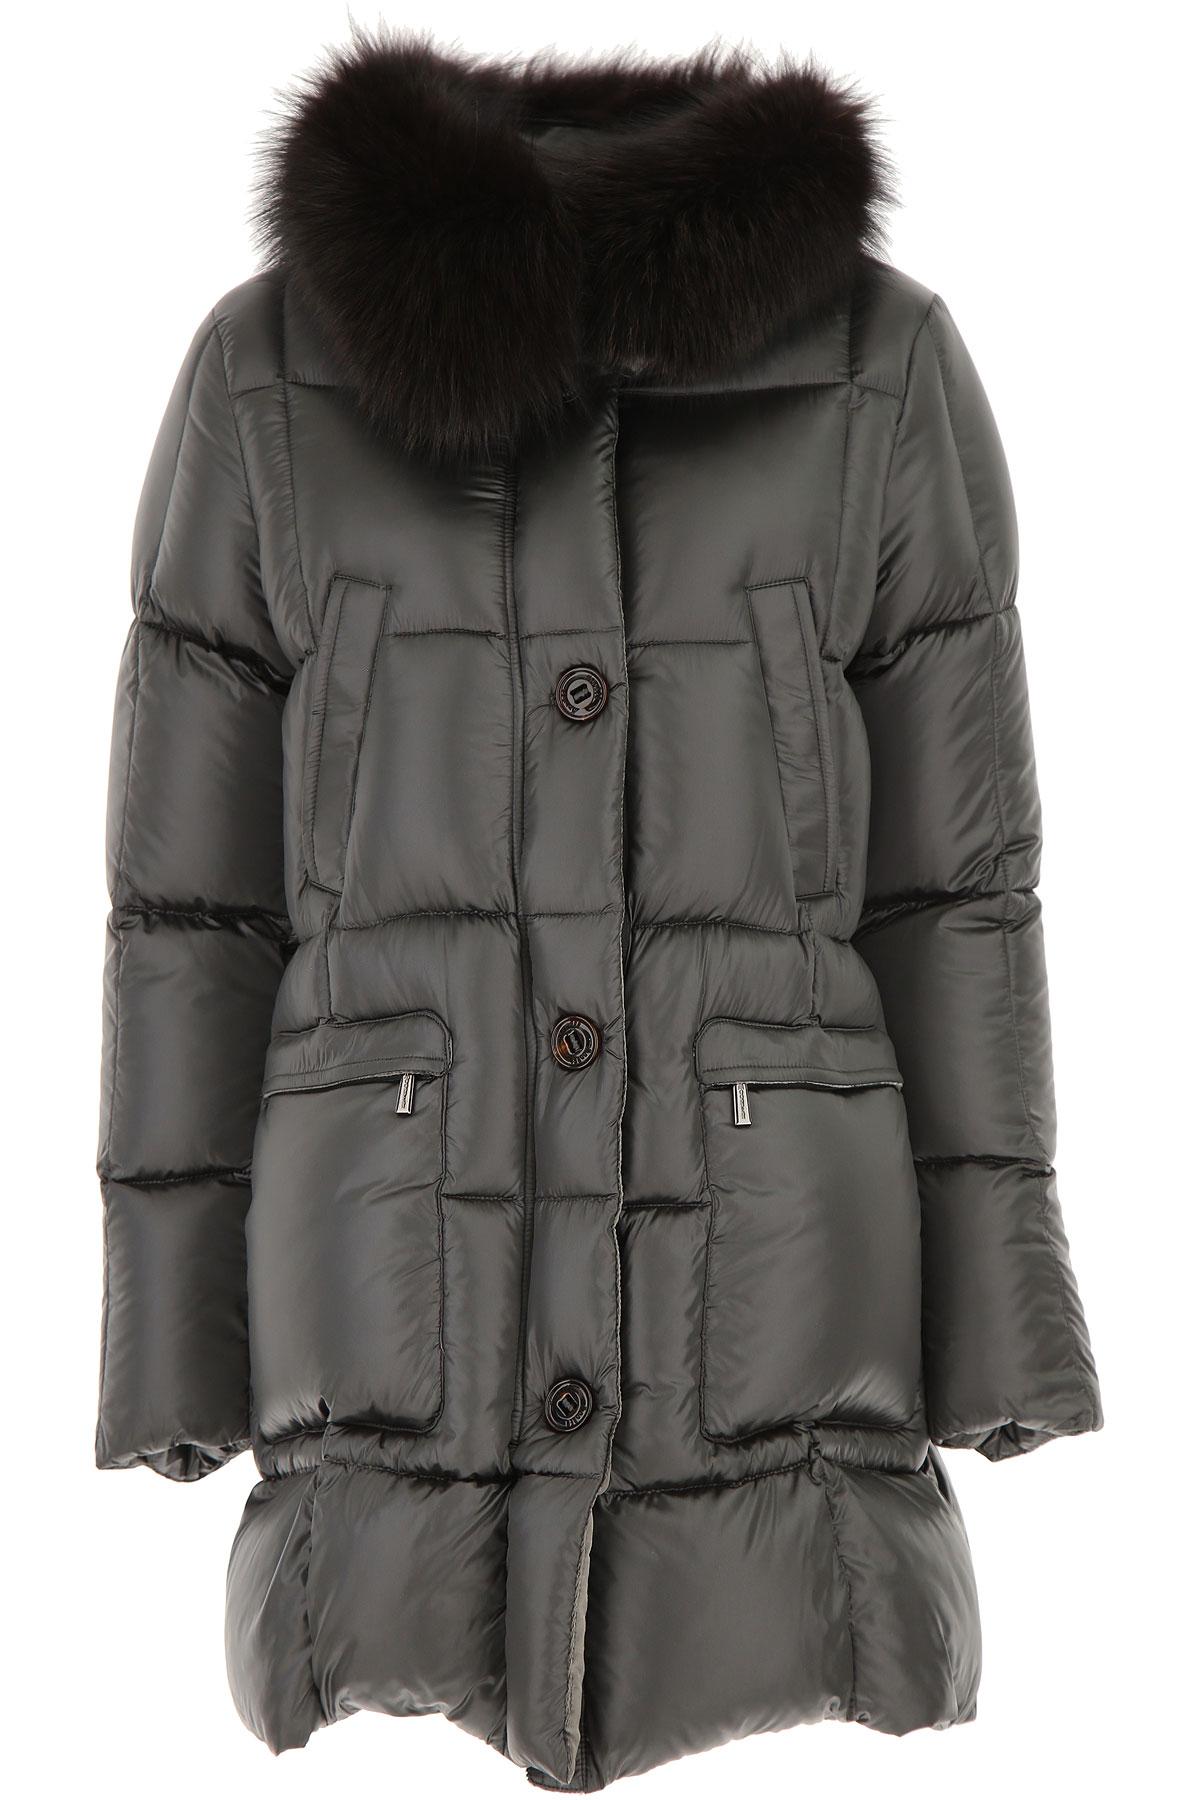 Moorer Down Jacket for Women, Puffer Ski Jacket On Sale, Blackboard Grey, polyamide, 2019, 10 8